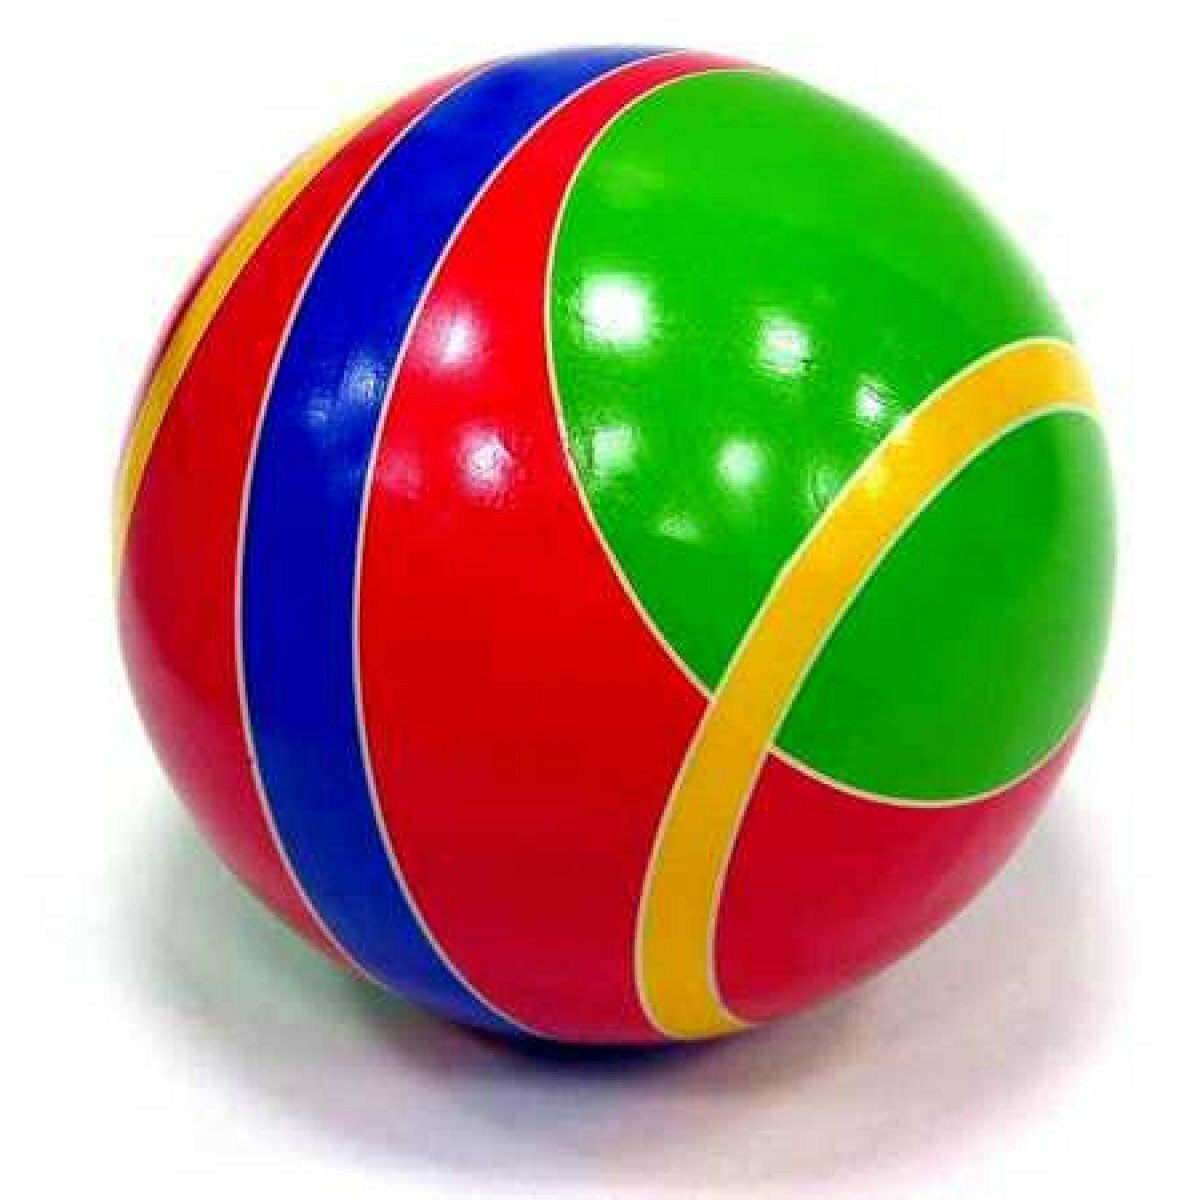 картинки для доу мяч разобраться среди